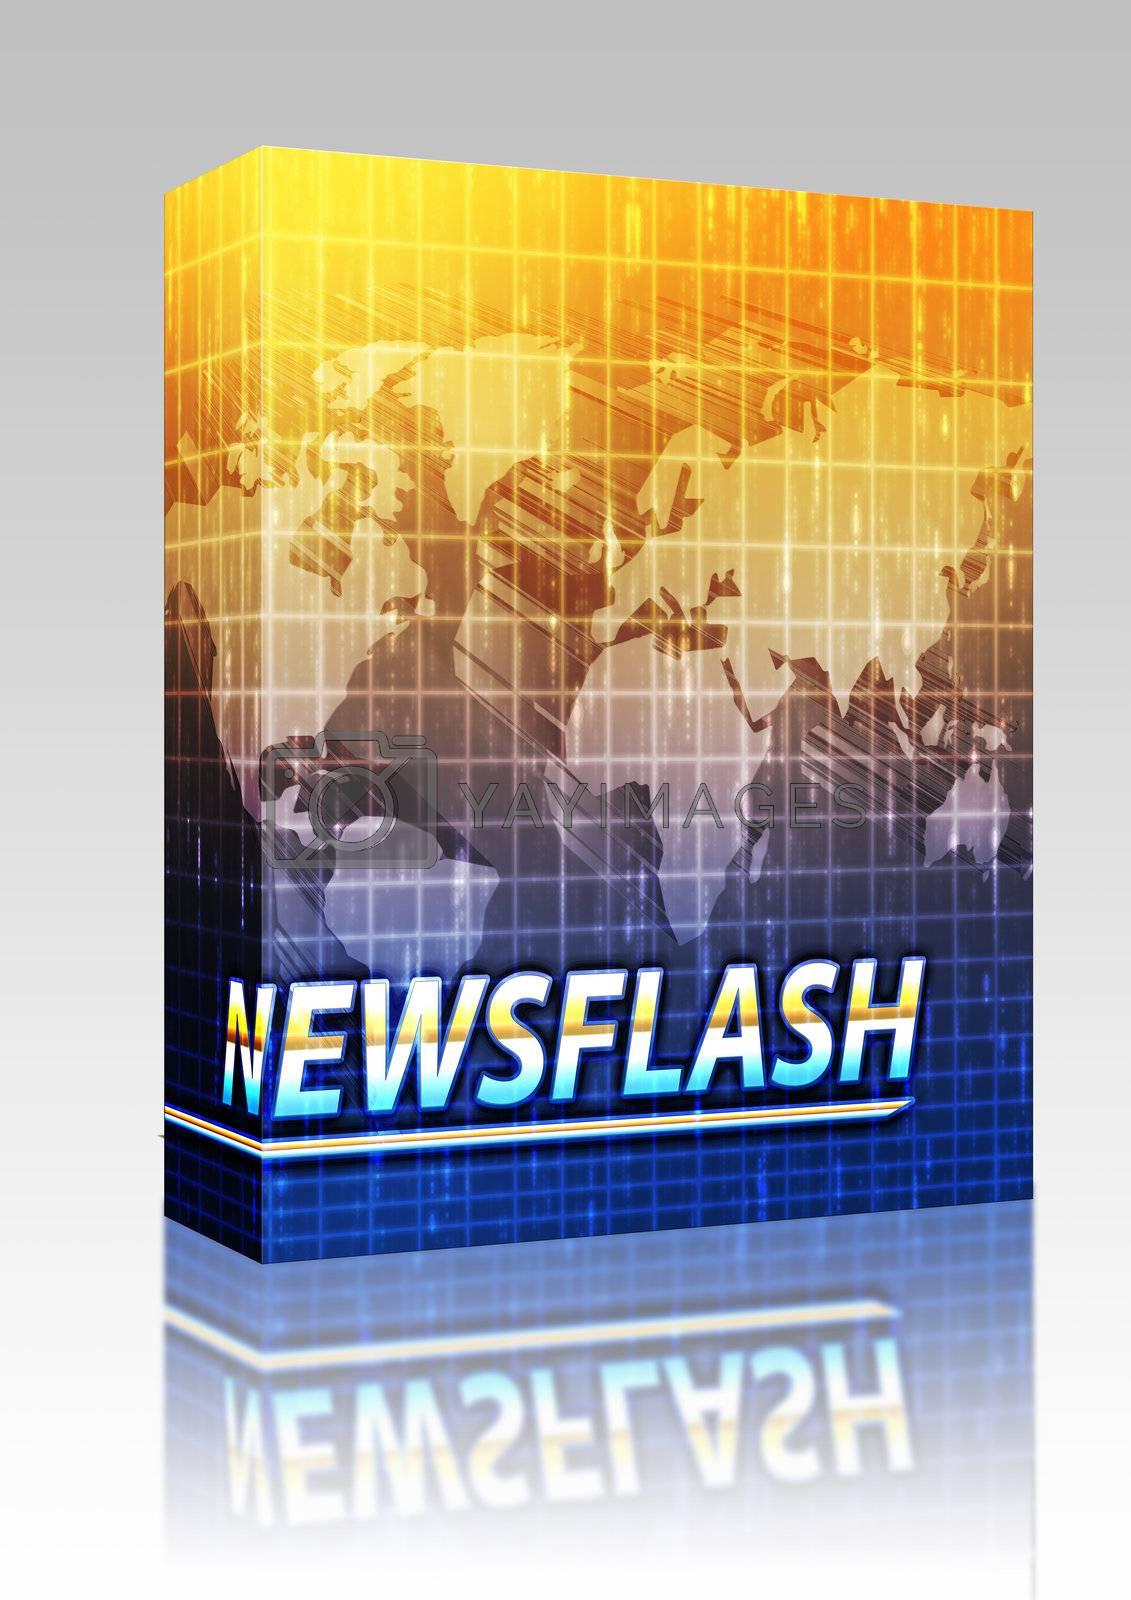 Software package box Latest breaking news newsflash splash screen announcement illustration